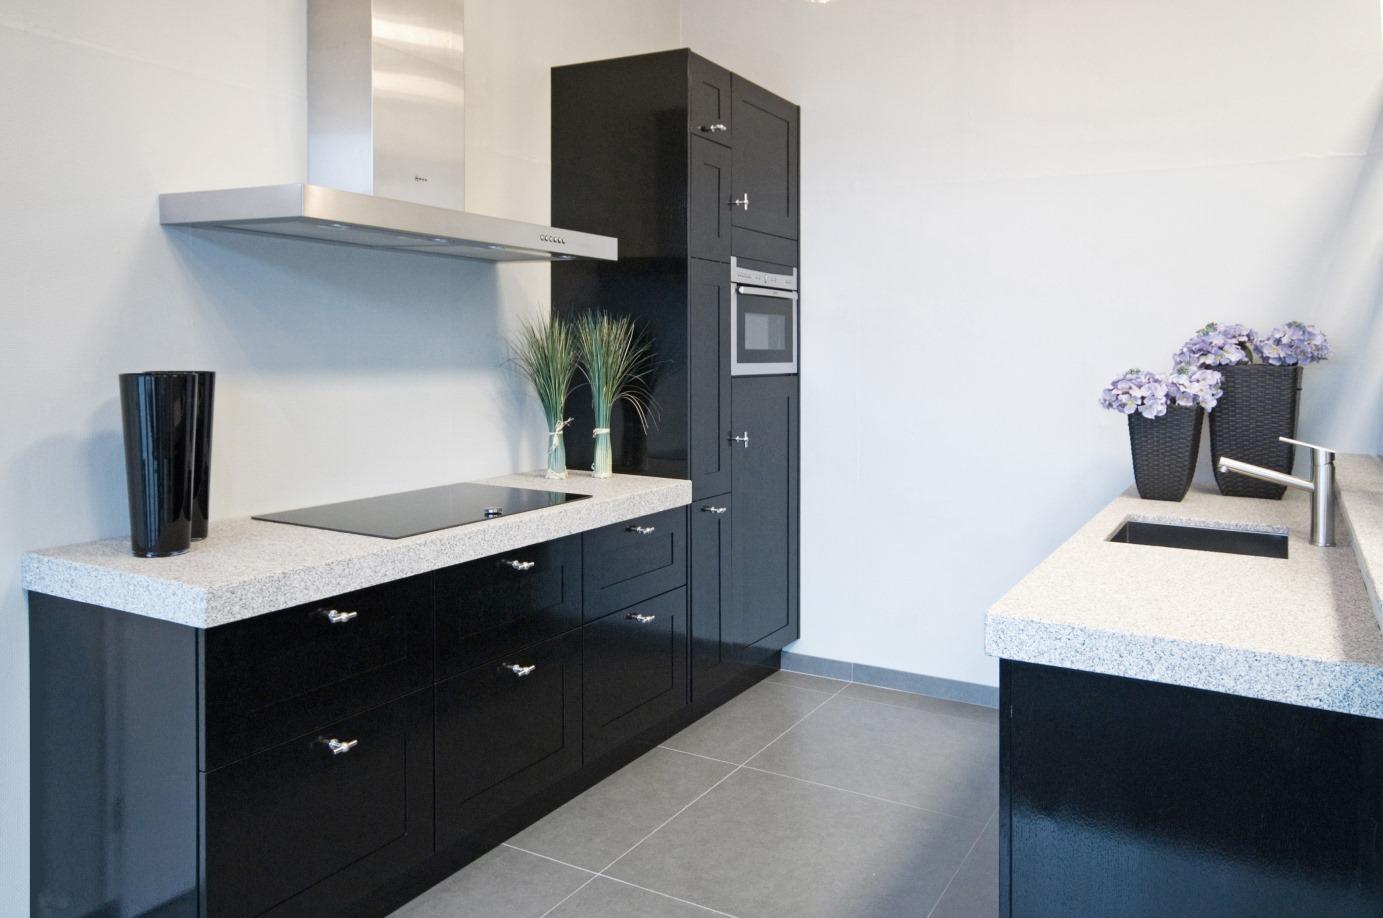 Marmer Zwart Keuken : Keuken marmer blad awesome keuken inspiratie marmeren blad marmer